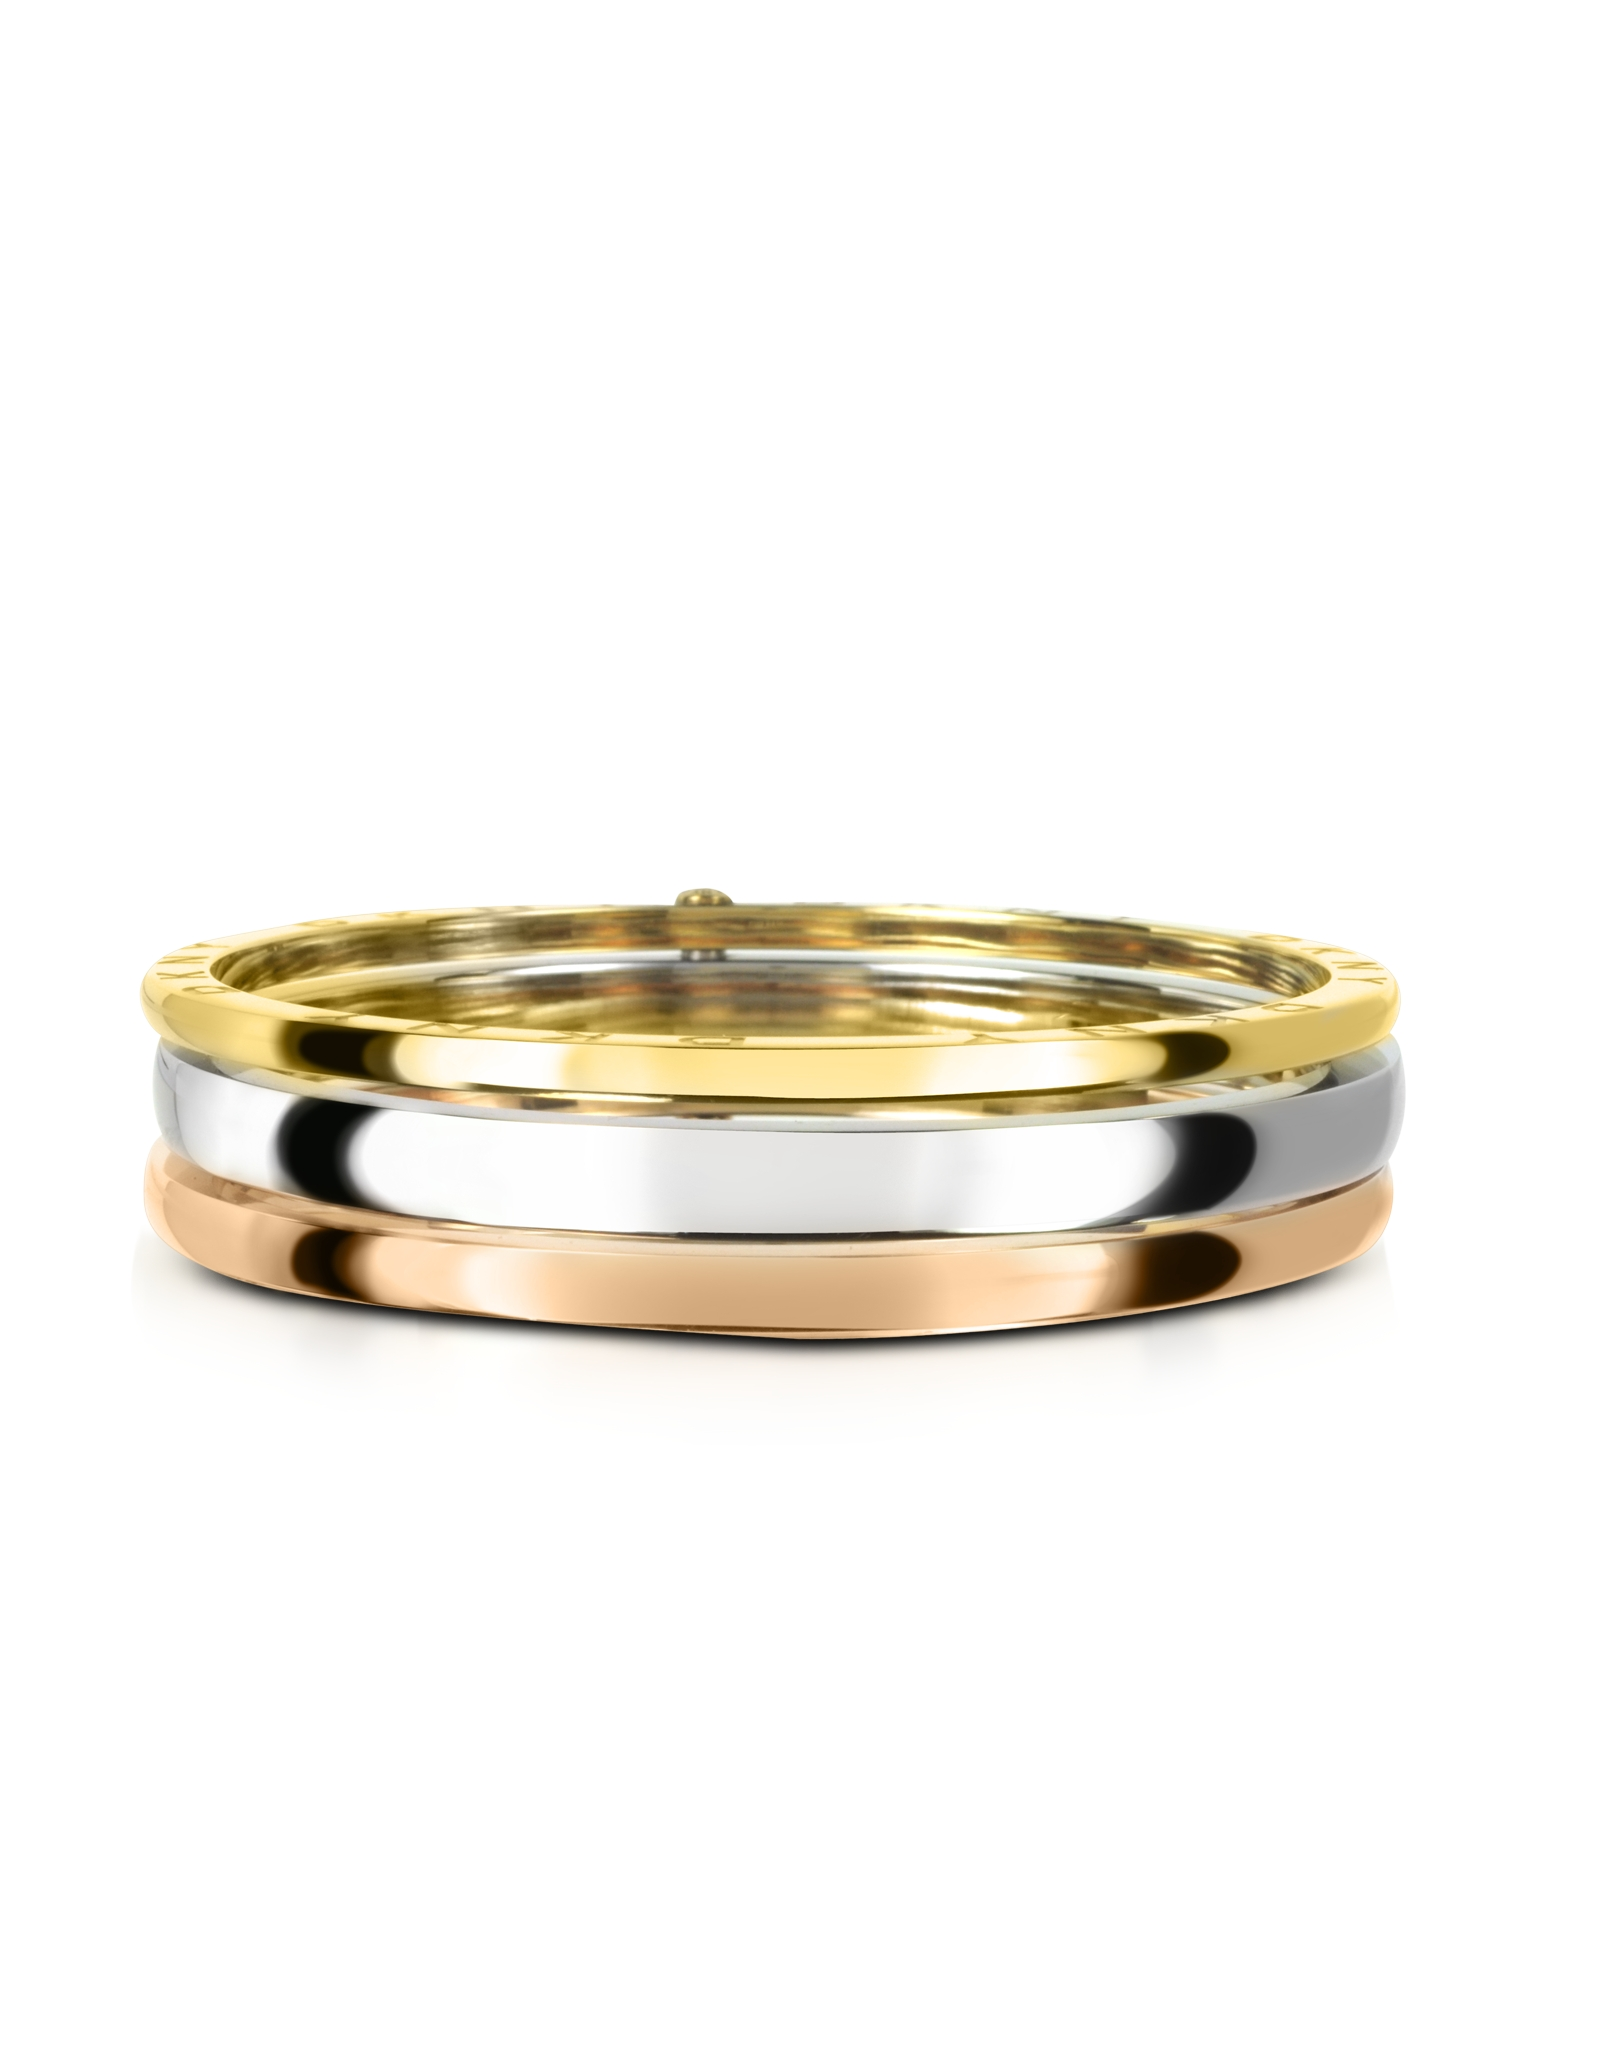 Lyst Dkny Stainless Steel Womens Bangle Bracelet In Metallic